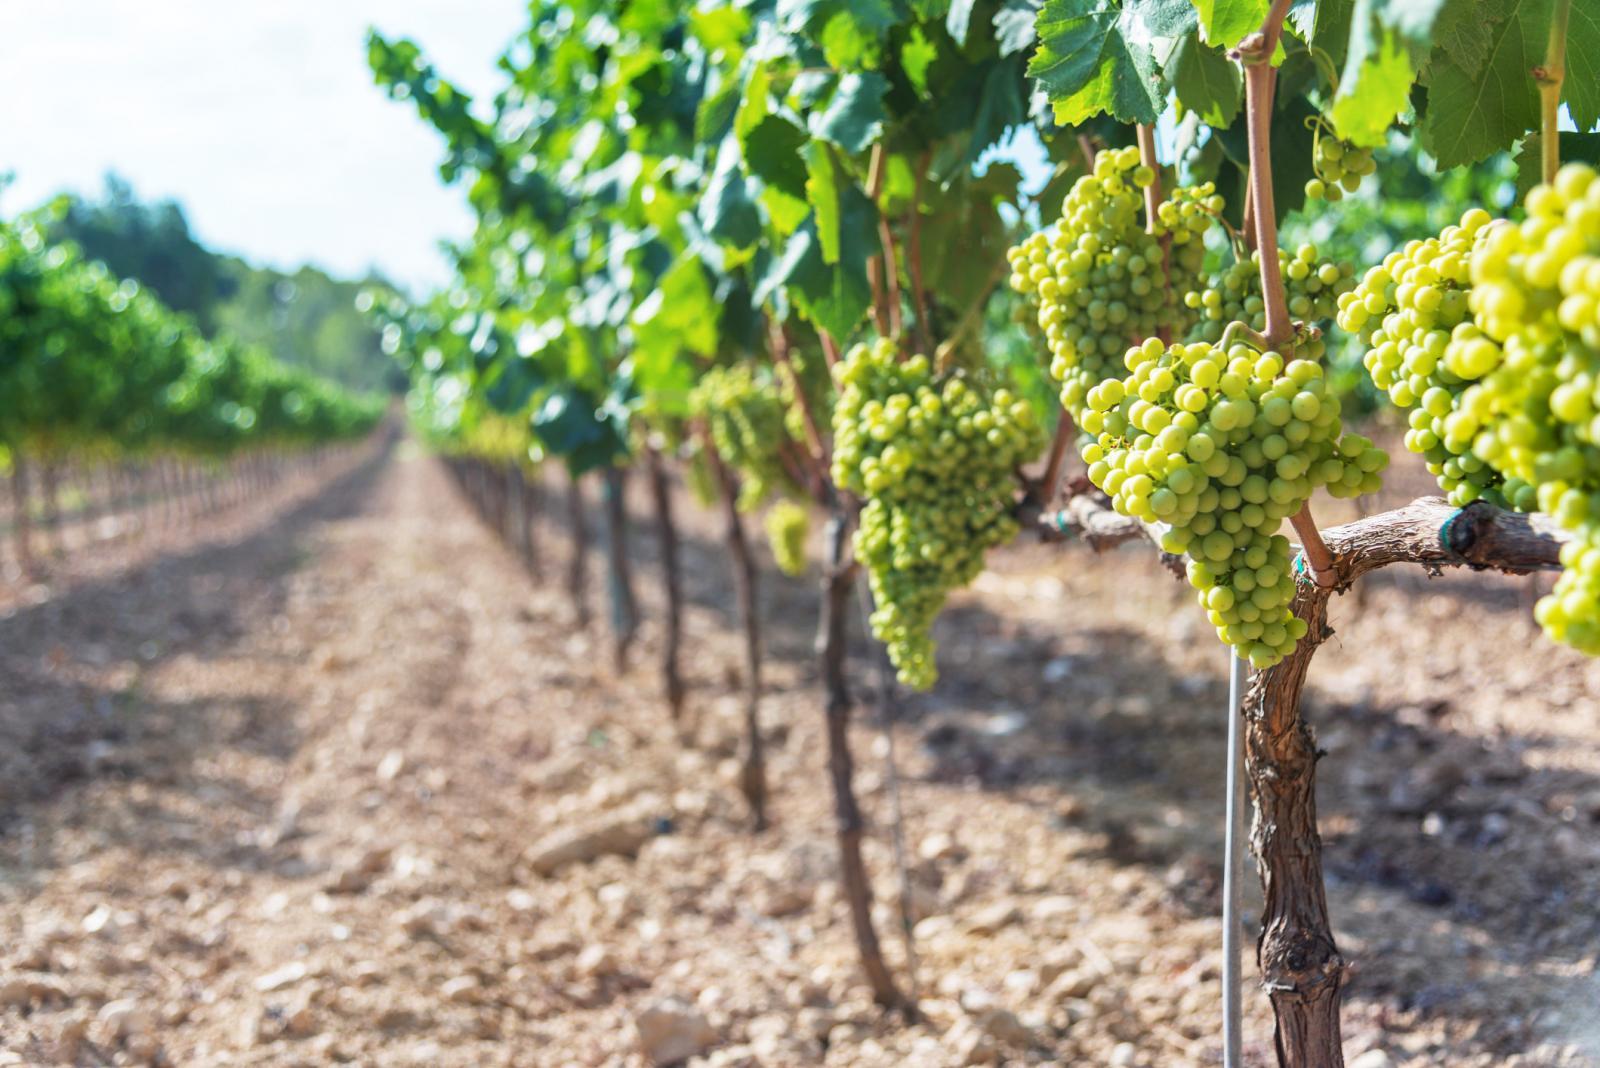 Uvas que crecen en viñedo